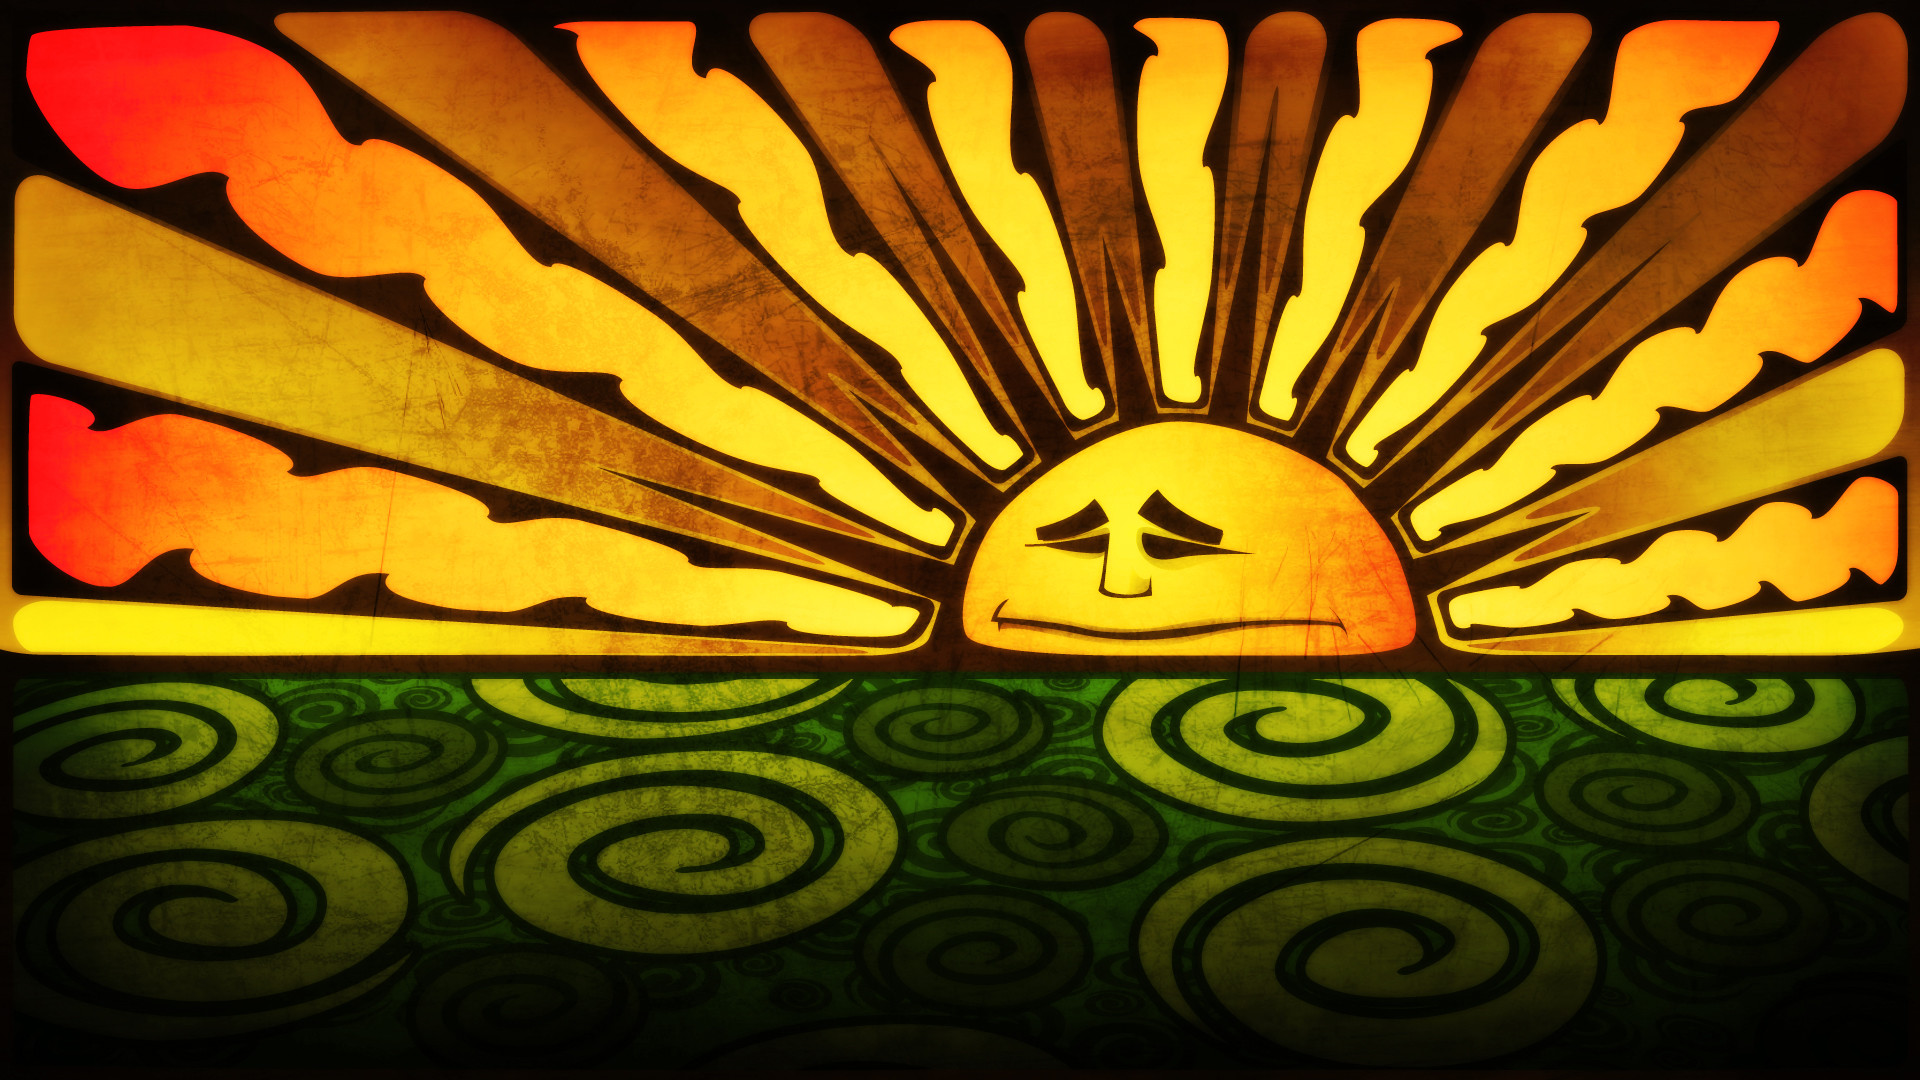 Sleepy Sun Wallpaper Sleepy, Sun, By, Colpo